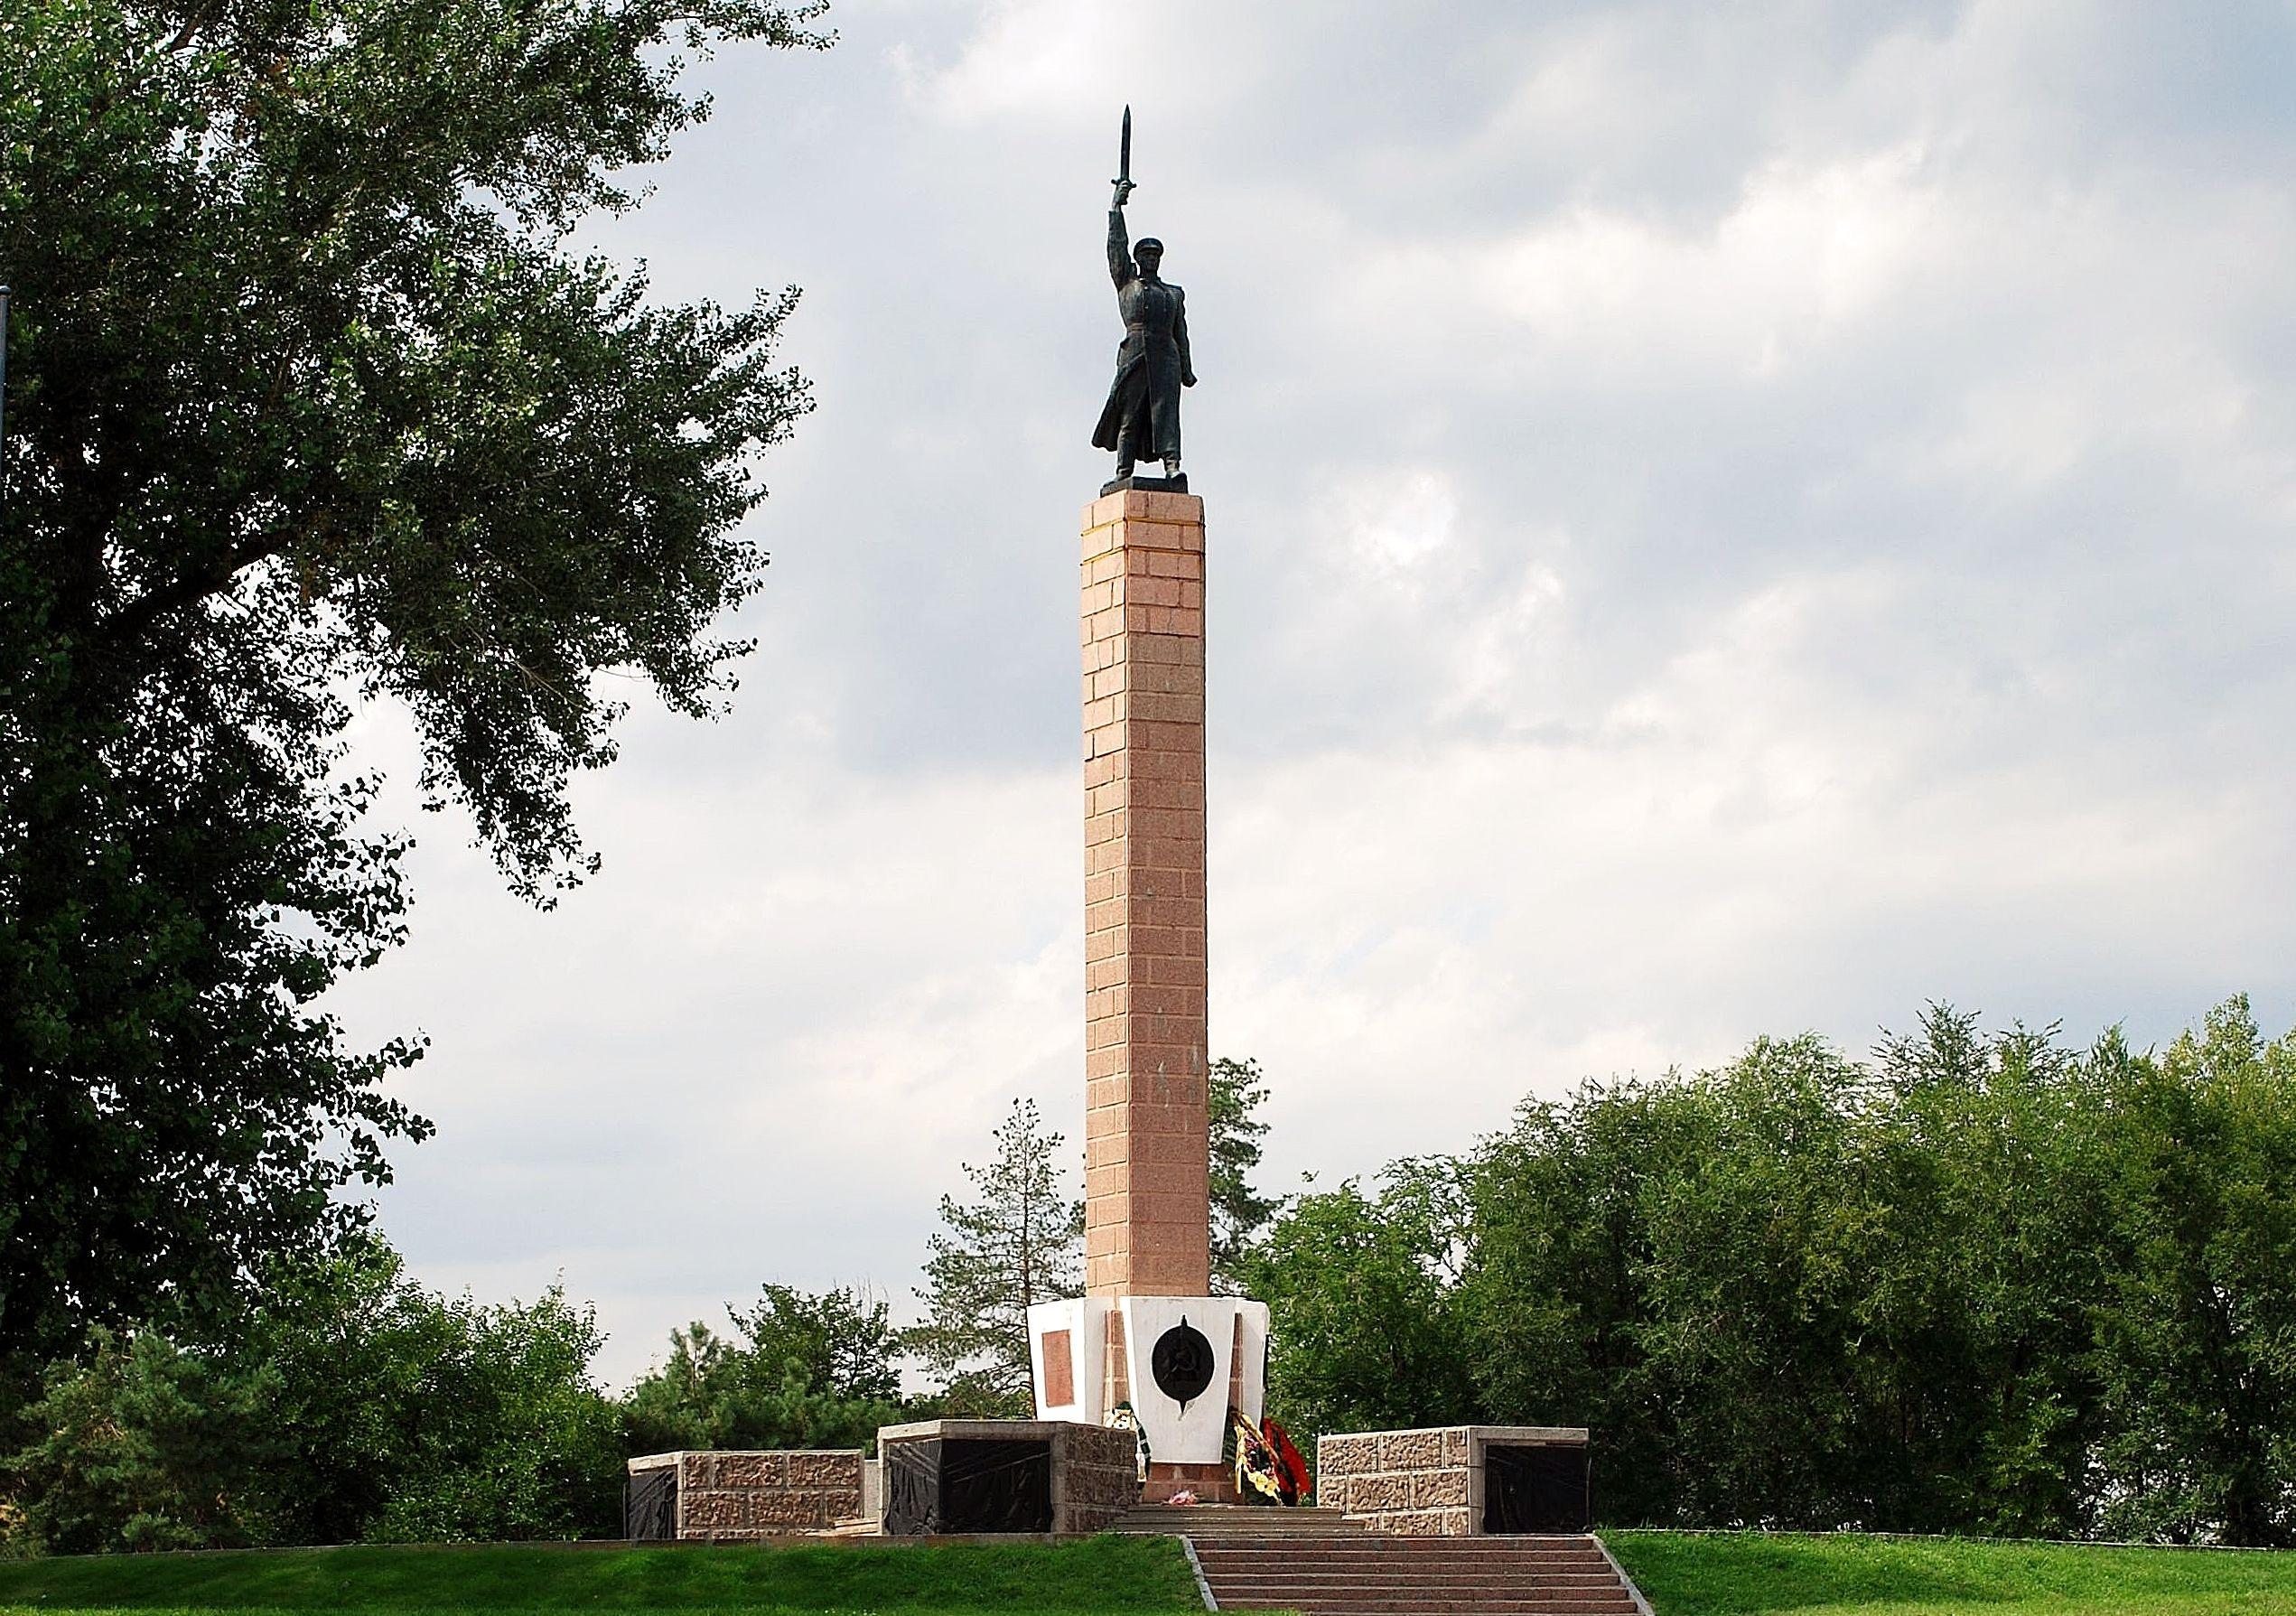 10-я дивизия НКВД-5